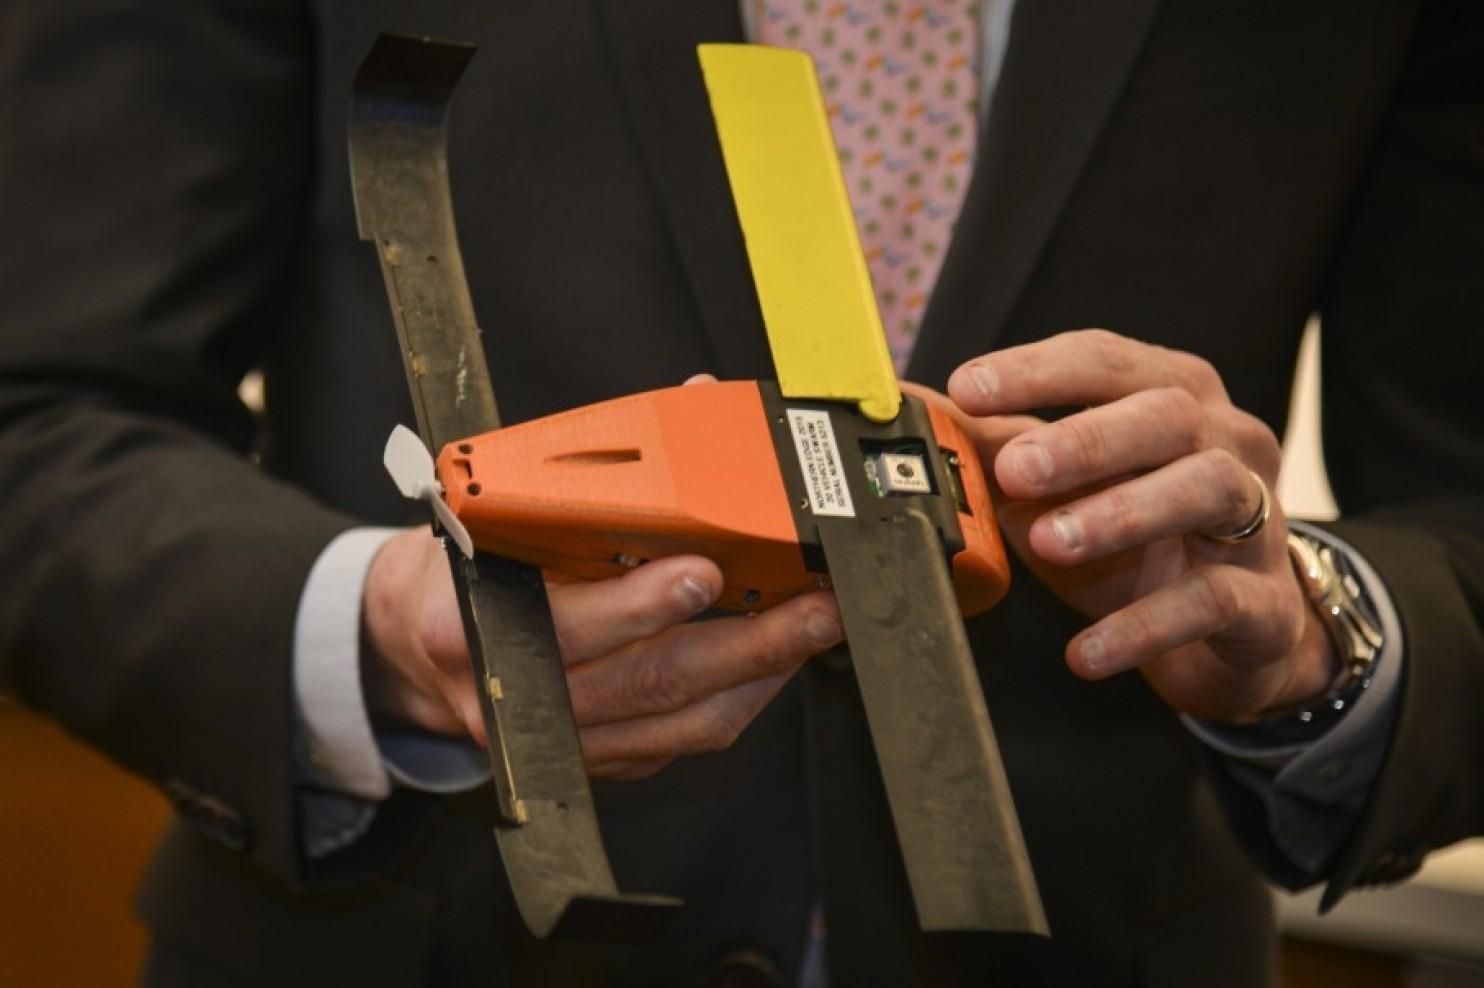 Close-up of the Pedrix drone. Photo by Jahi Chikwendiu/The Washington Post